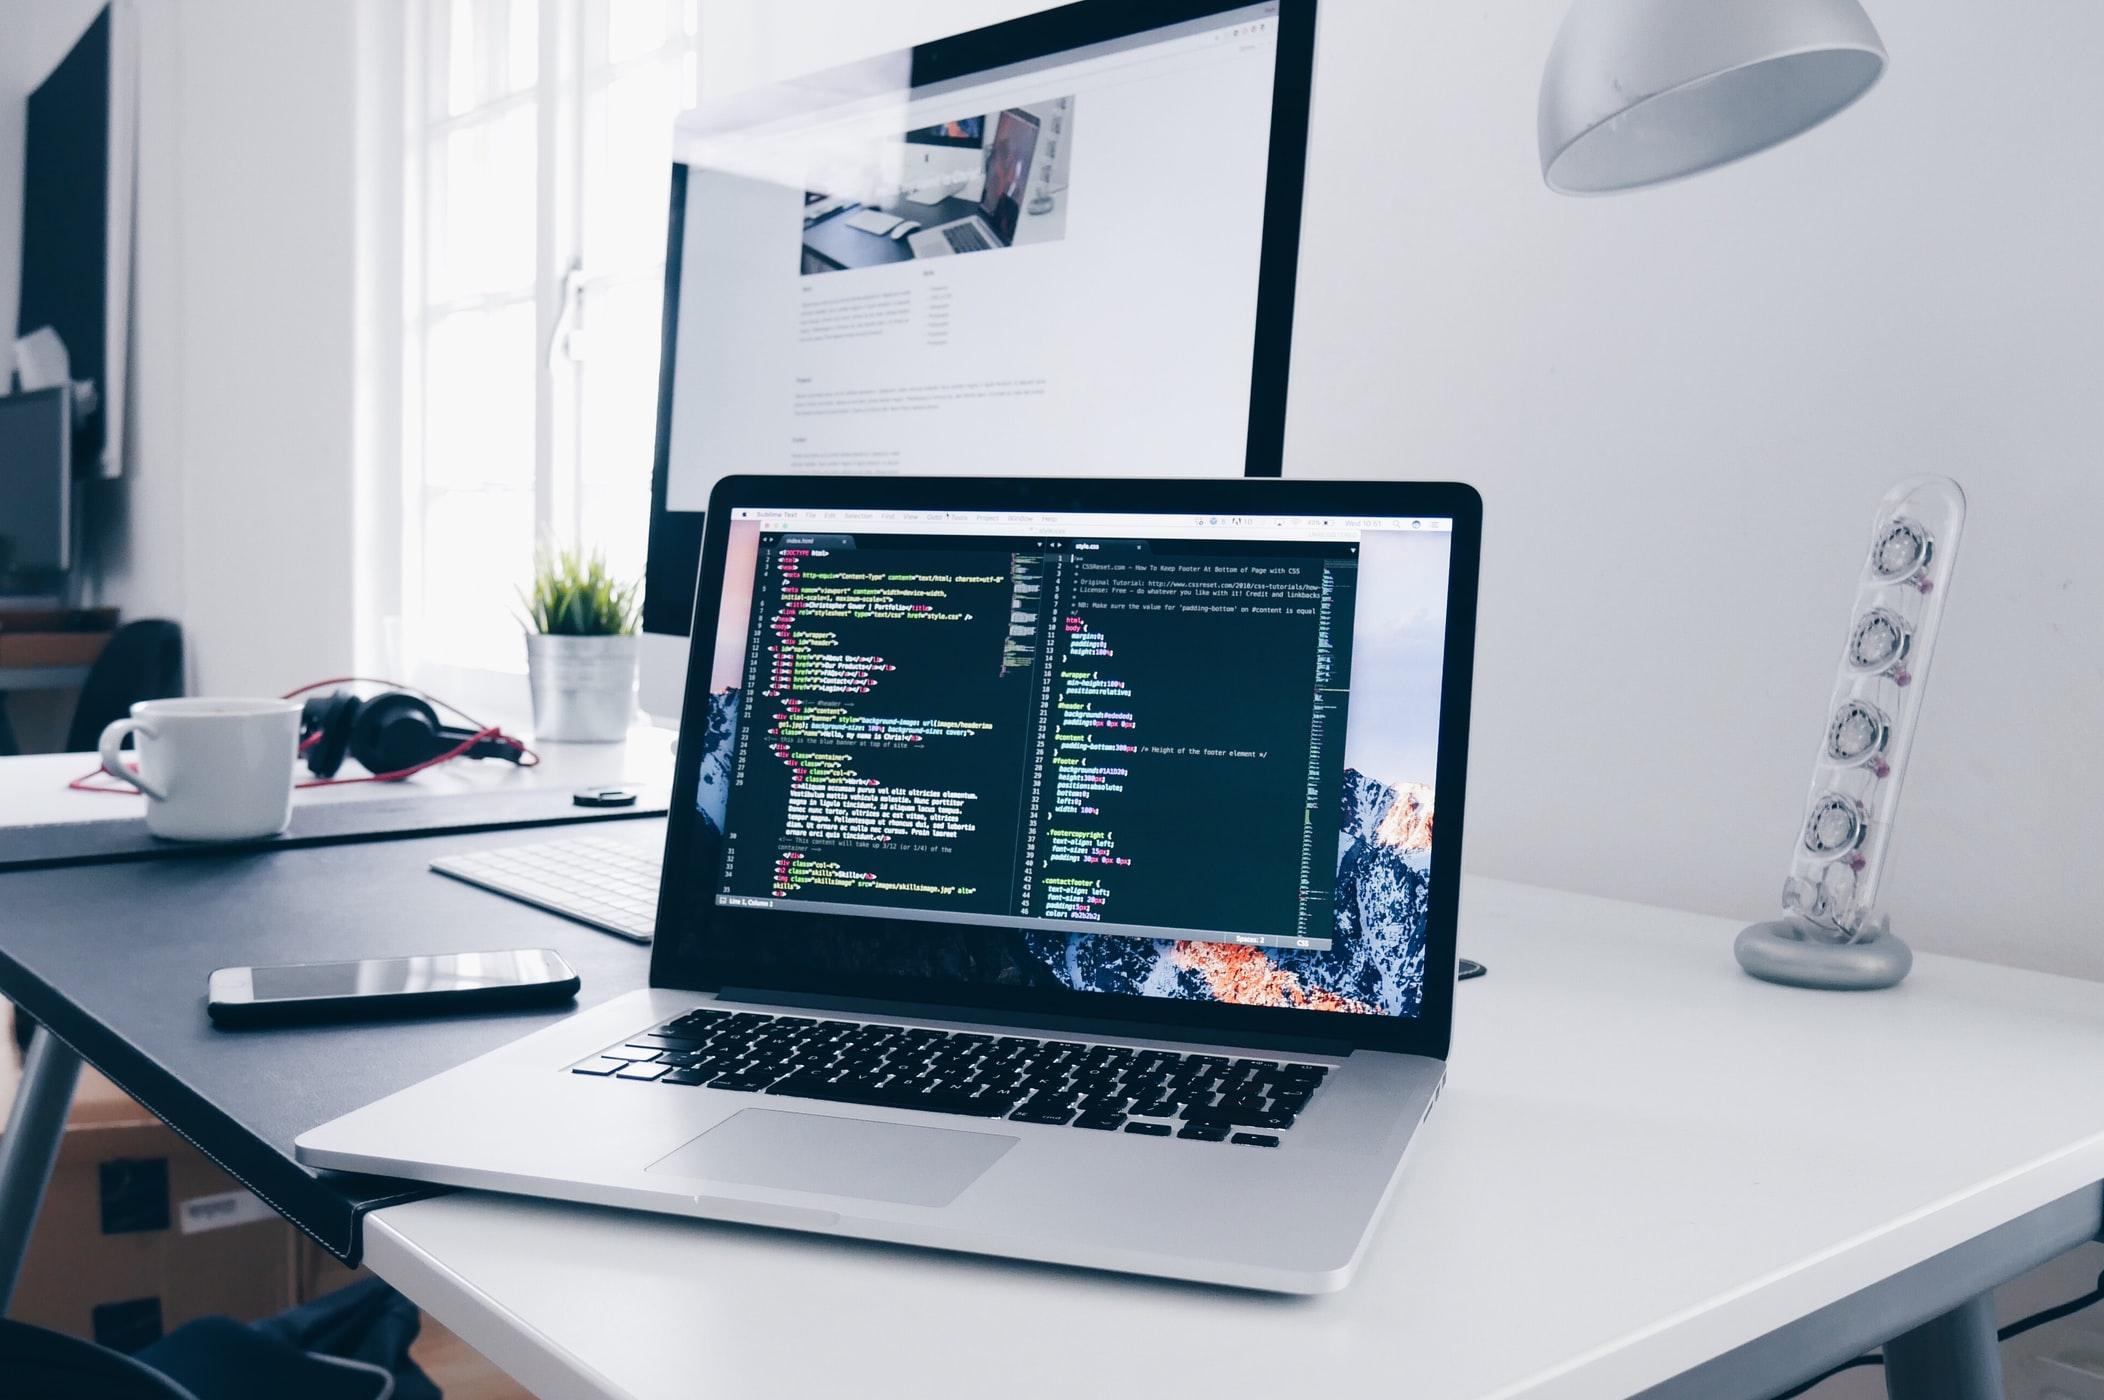 How TikTok Got Me Into Tech - With Zero Experience